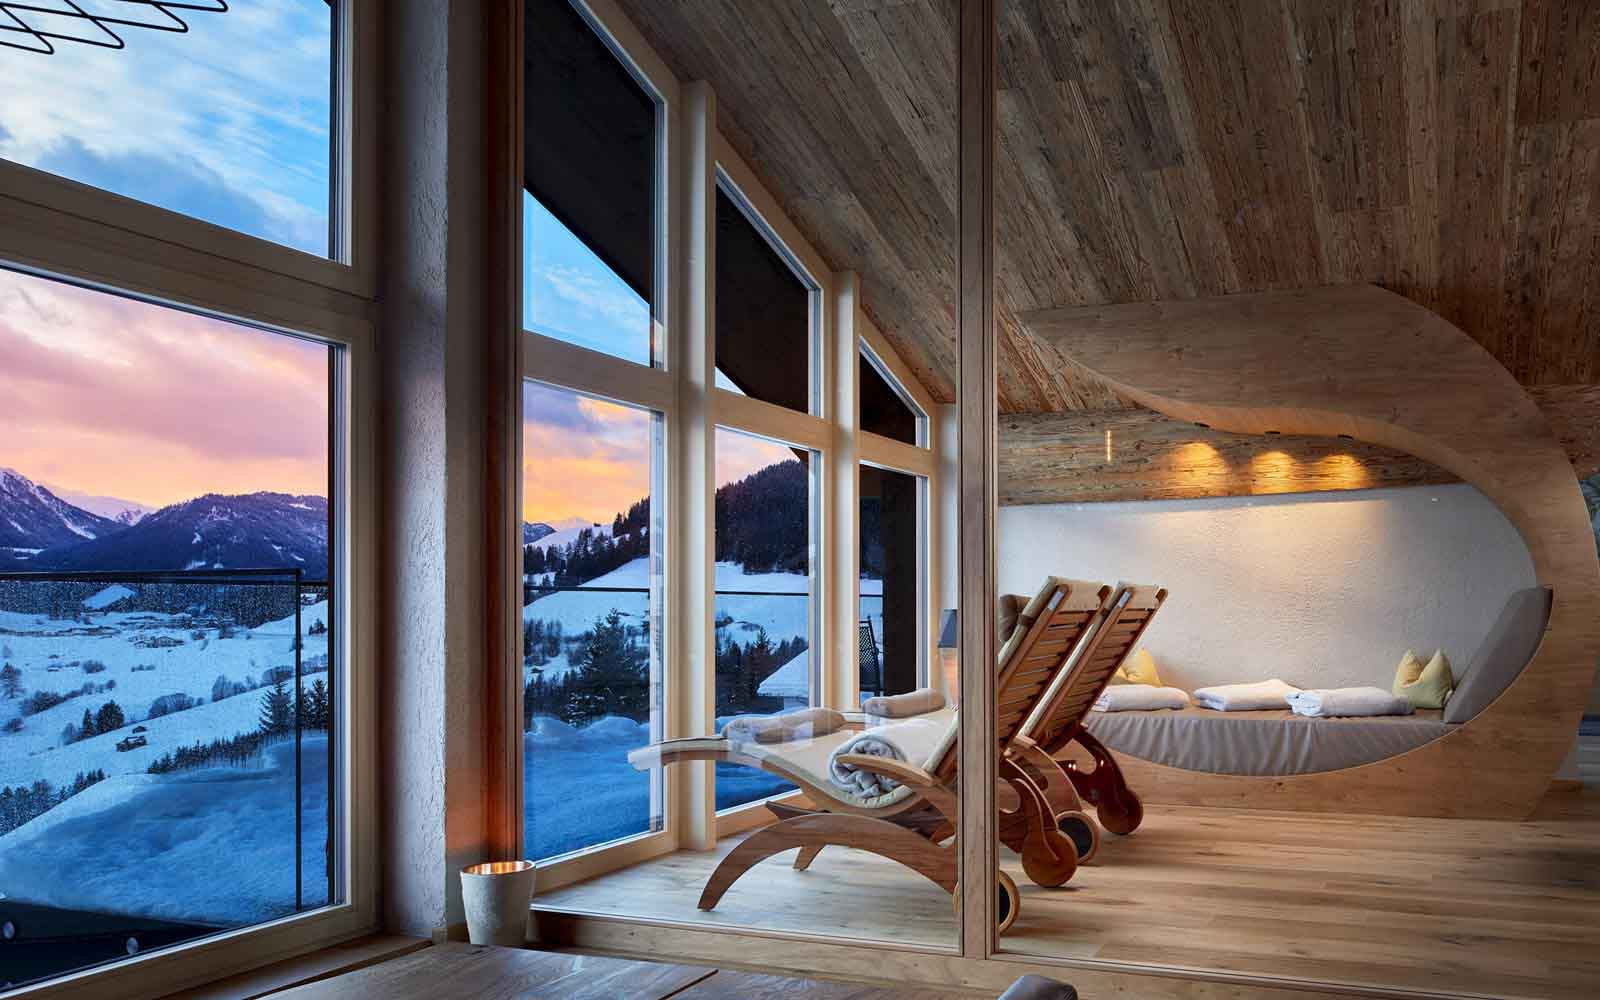 Hotel Tirol Fiss Serfaus-Ladis-Fiss Tyrol Austria Lifestyle-Hotel Winter Holidays Skiing New fourth floor Gipfel SPA